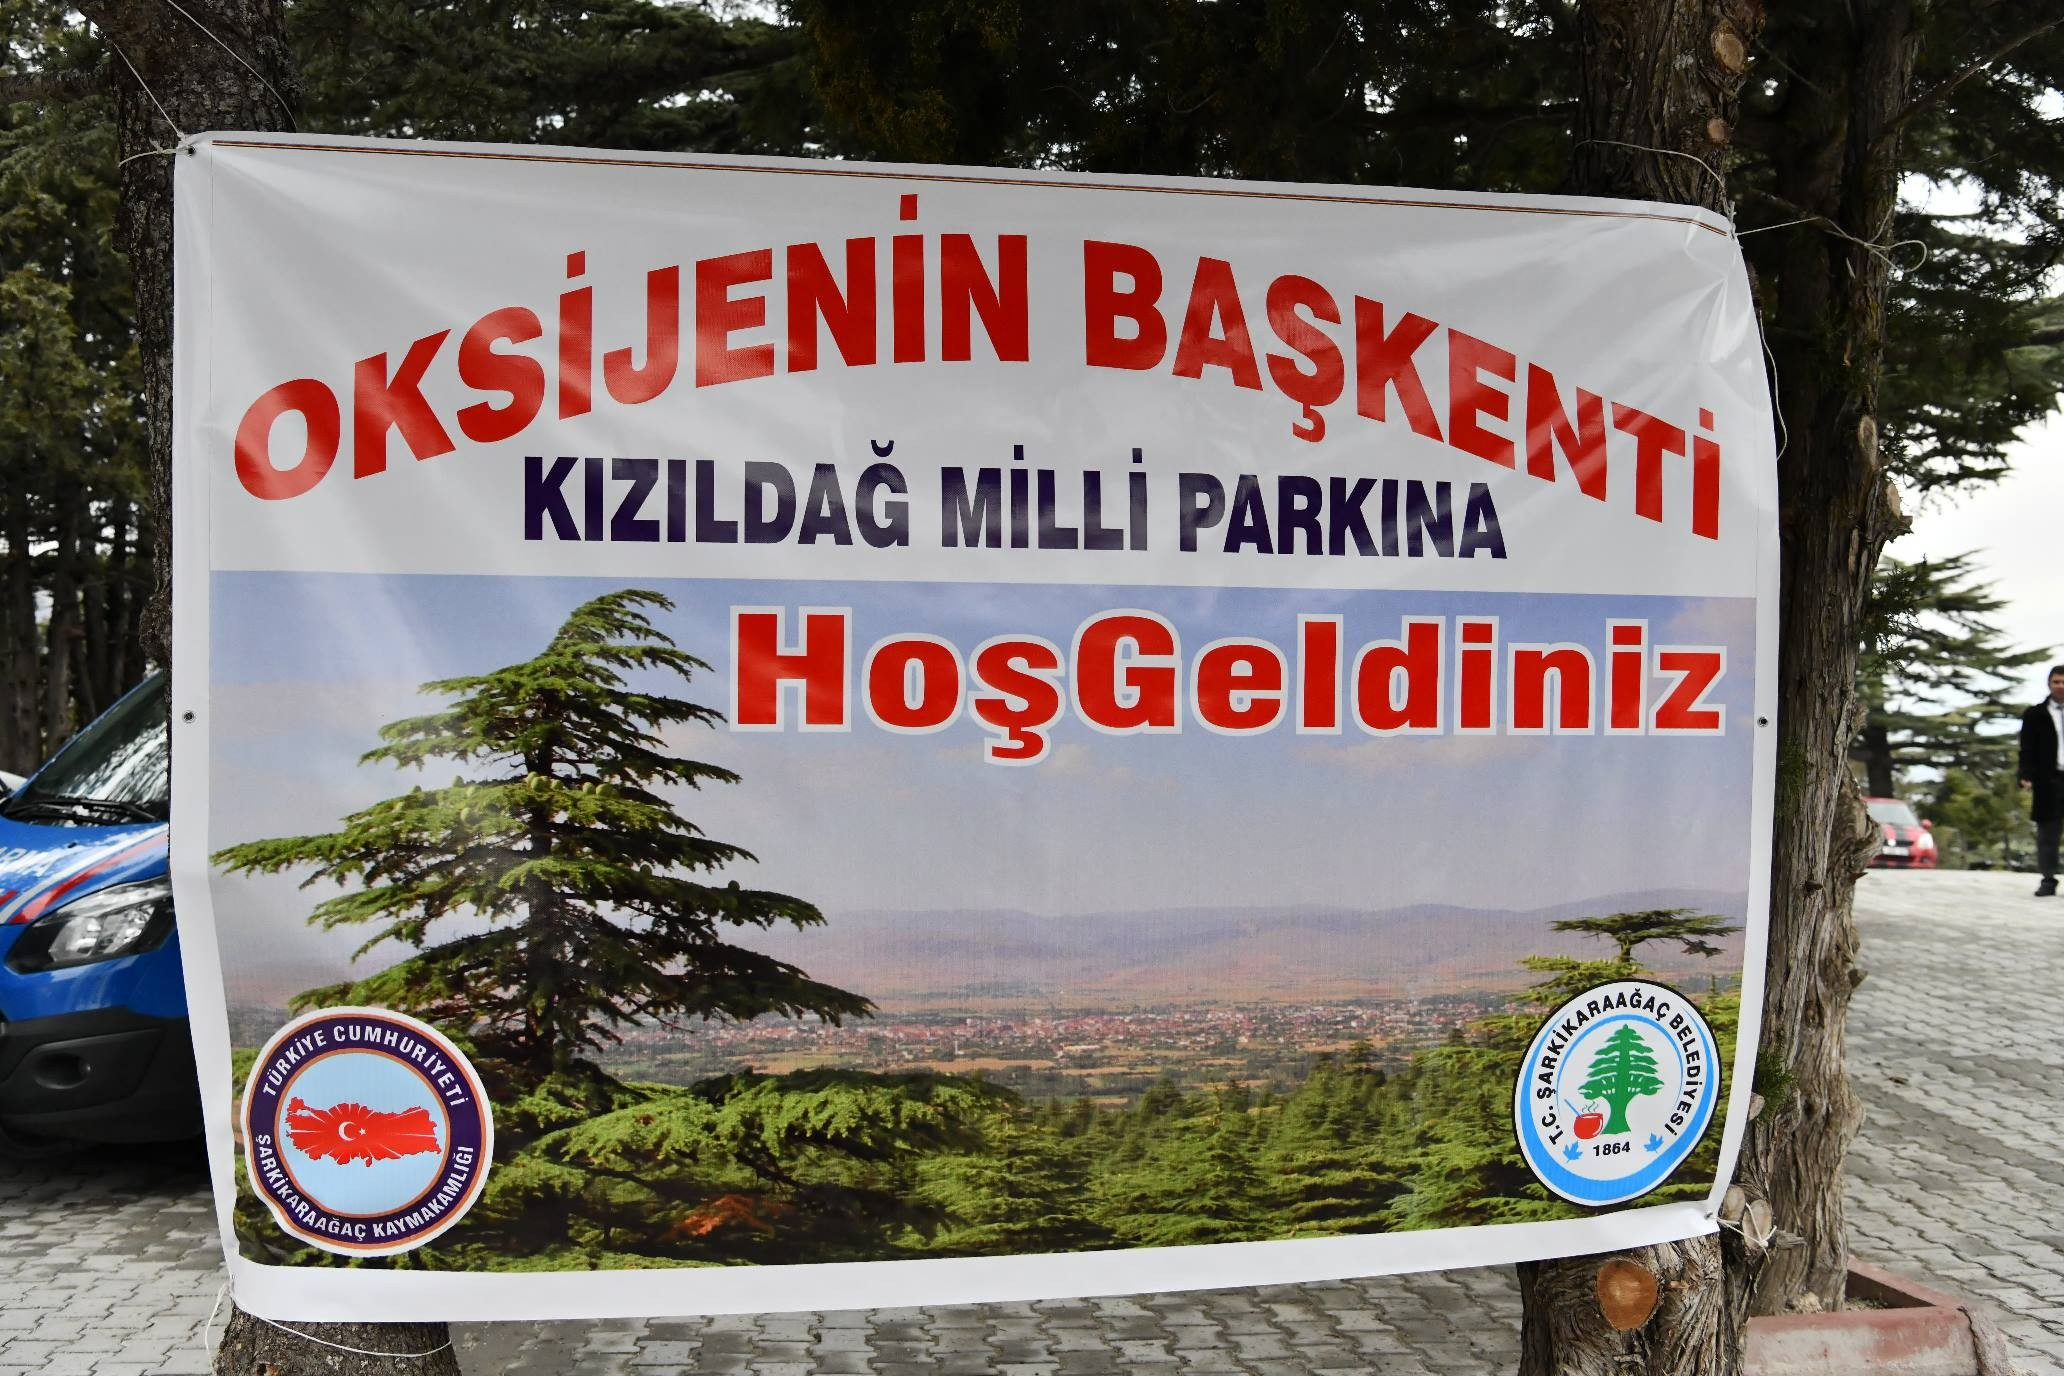 Oksijen Cenneti Isparta  Kızıldağ Milli Parkı